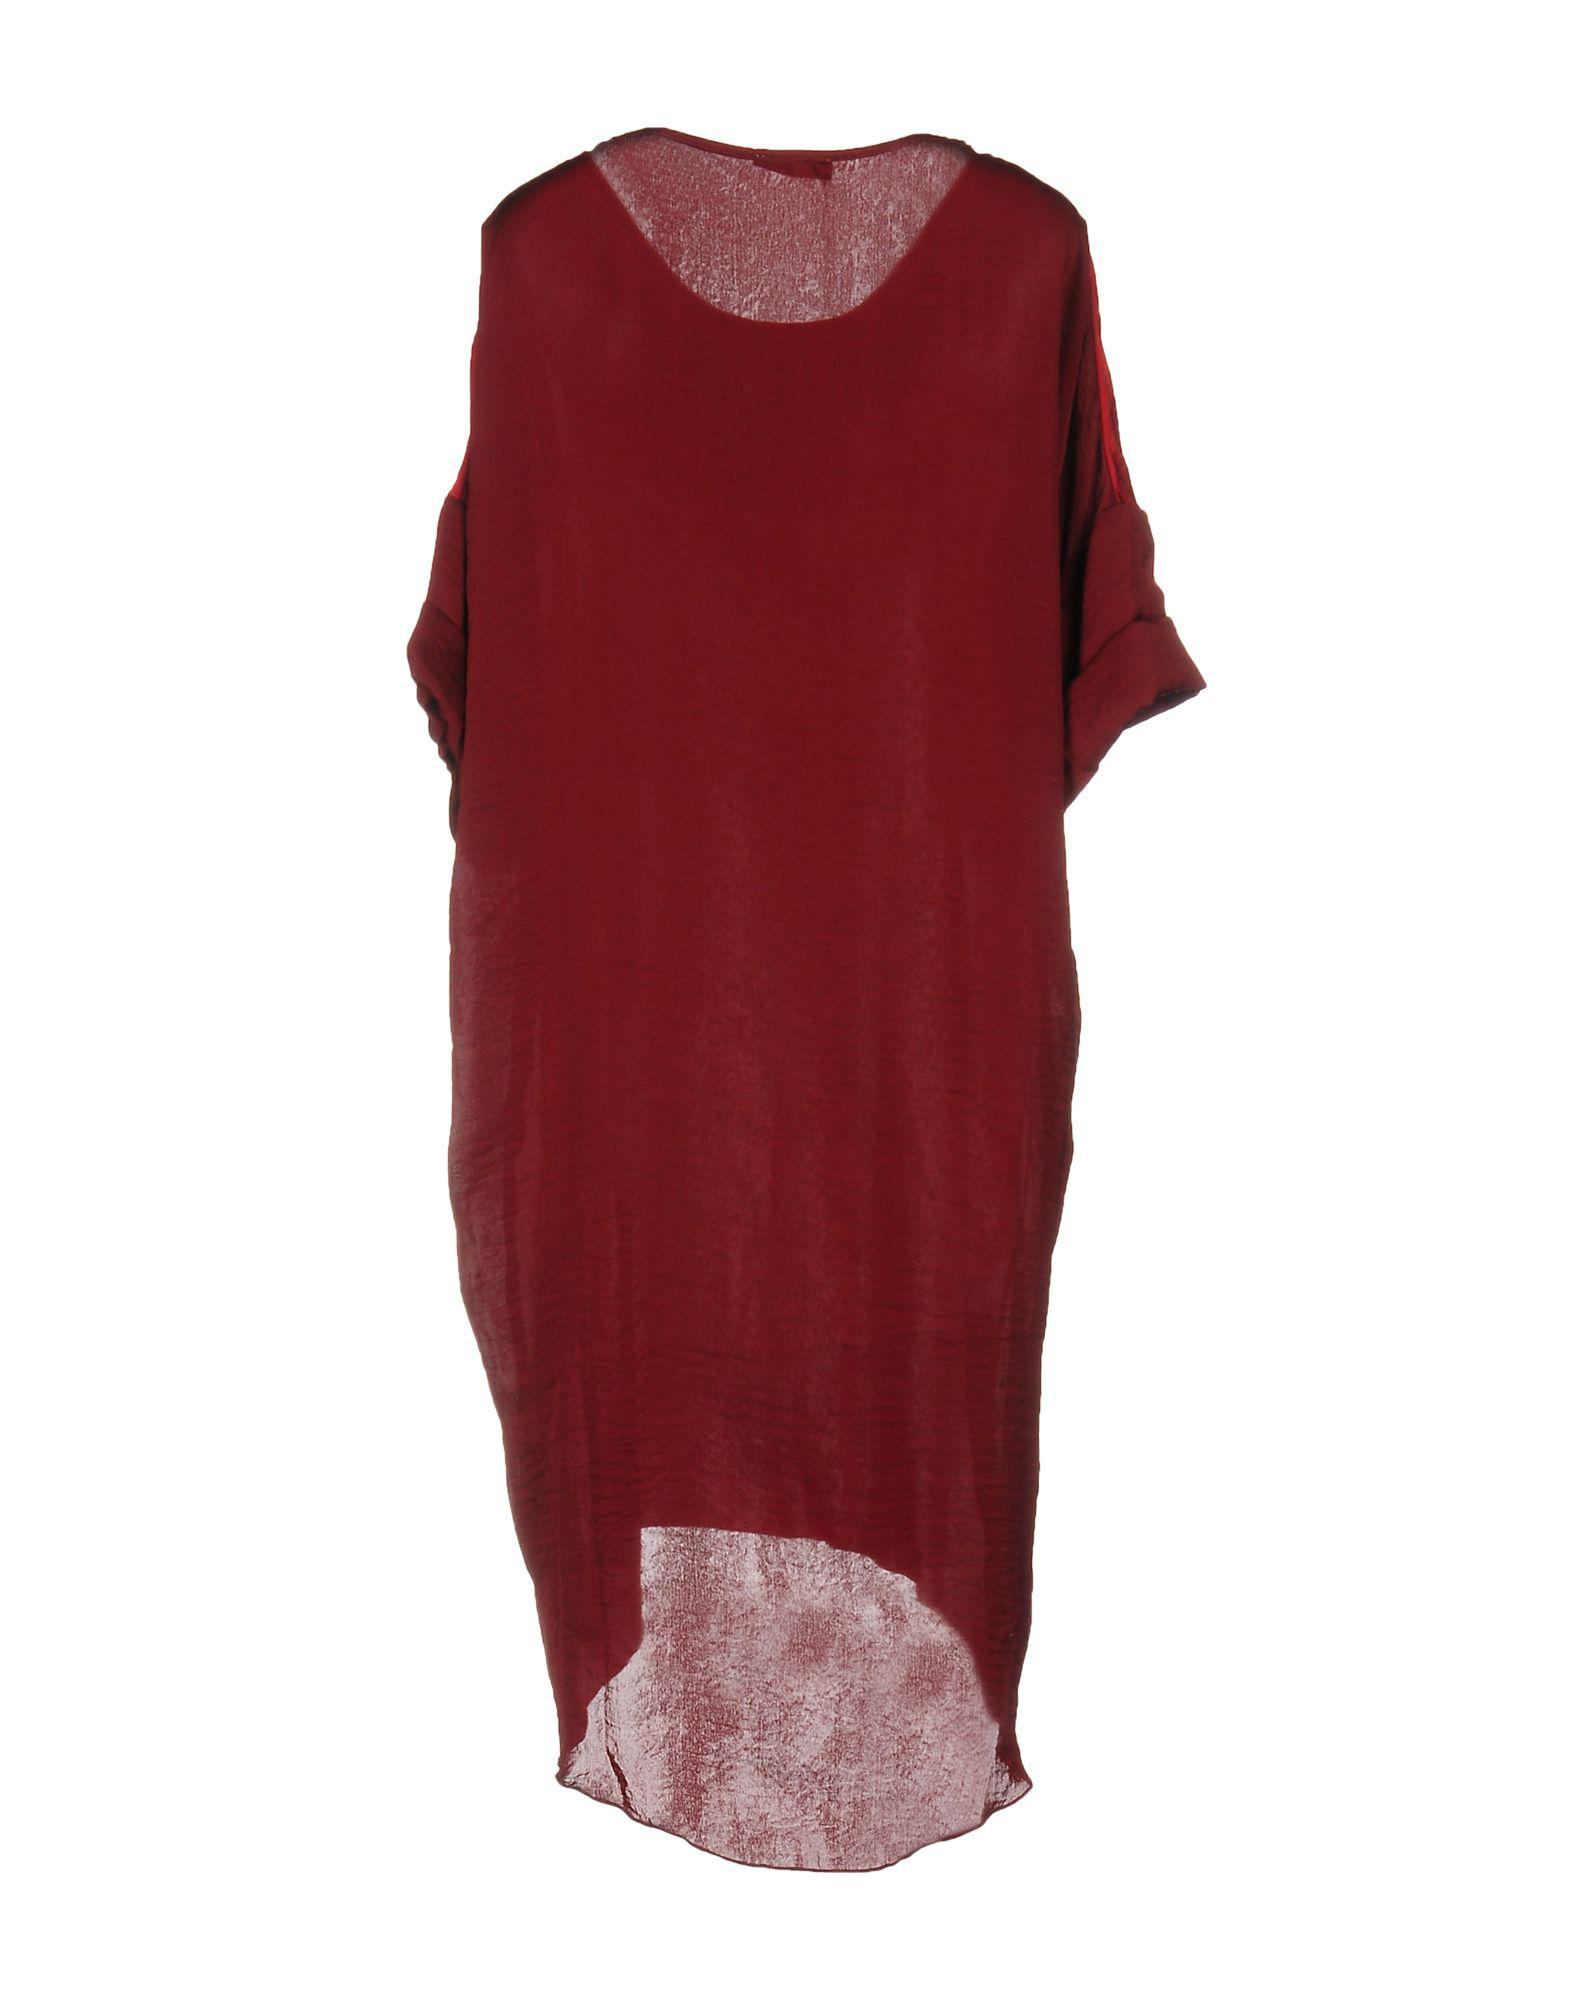 DRESSES - Short dresses Teatum Jones nBUfRWAcf